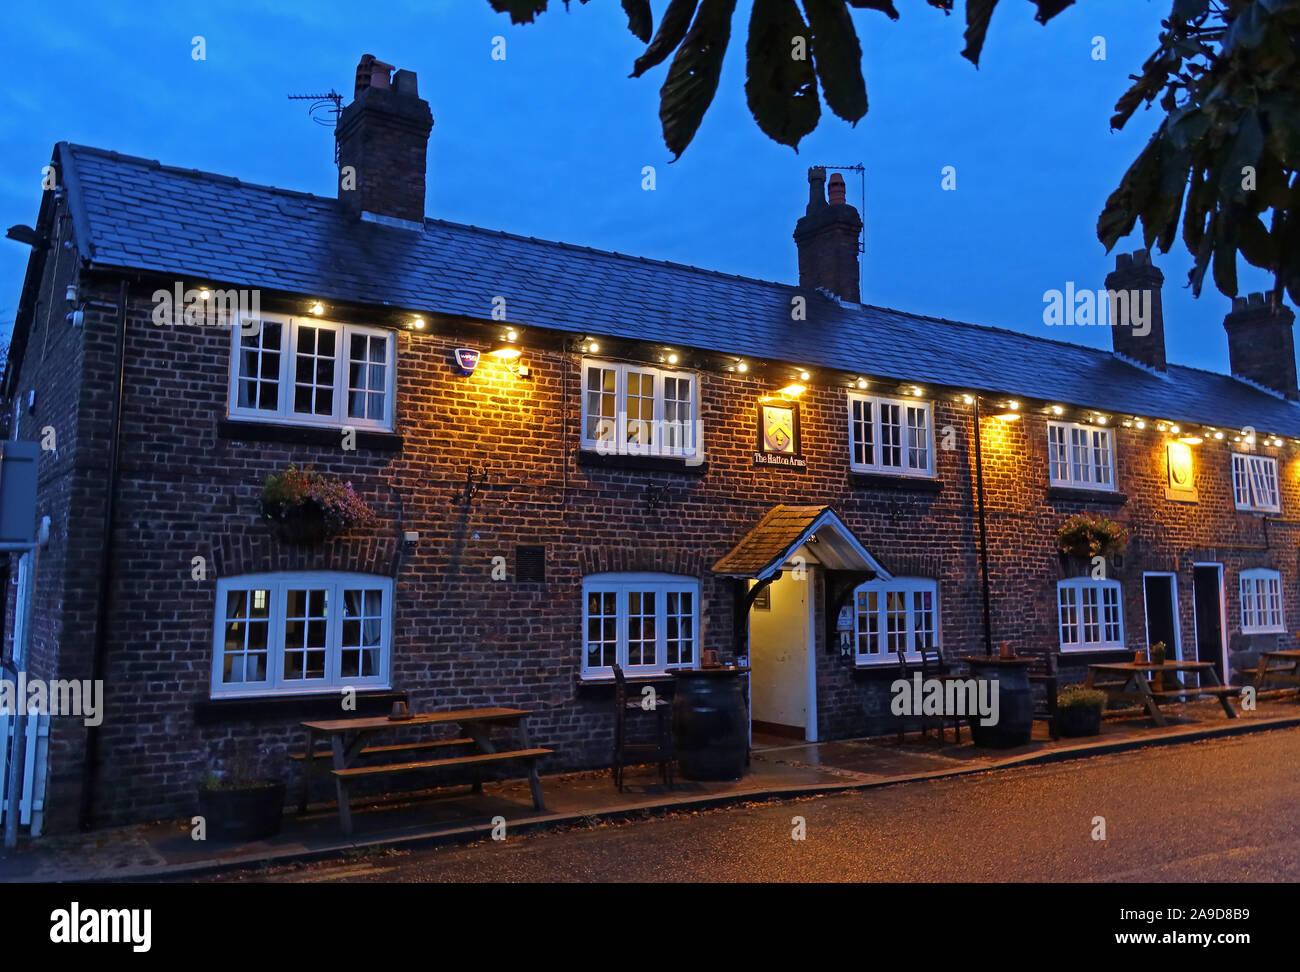 @HotpixUK,HotpixUK,GoTonySmith,Village,evening,night,nighttime,night time,England,UK,North West England,United Kingdom,CAMRA,real ale,pub,bar,Hatton Ln,Hatton,Cheshire,WA4 4DB,blue hour,dusk,Hatton Lane,Warrington,North West,WA4,autumn,village post office,grade II listed,building,Lewis Carroll,birthplace,home,sign,history,historic,historic pub